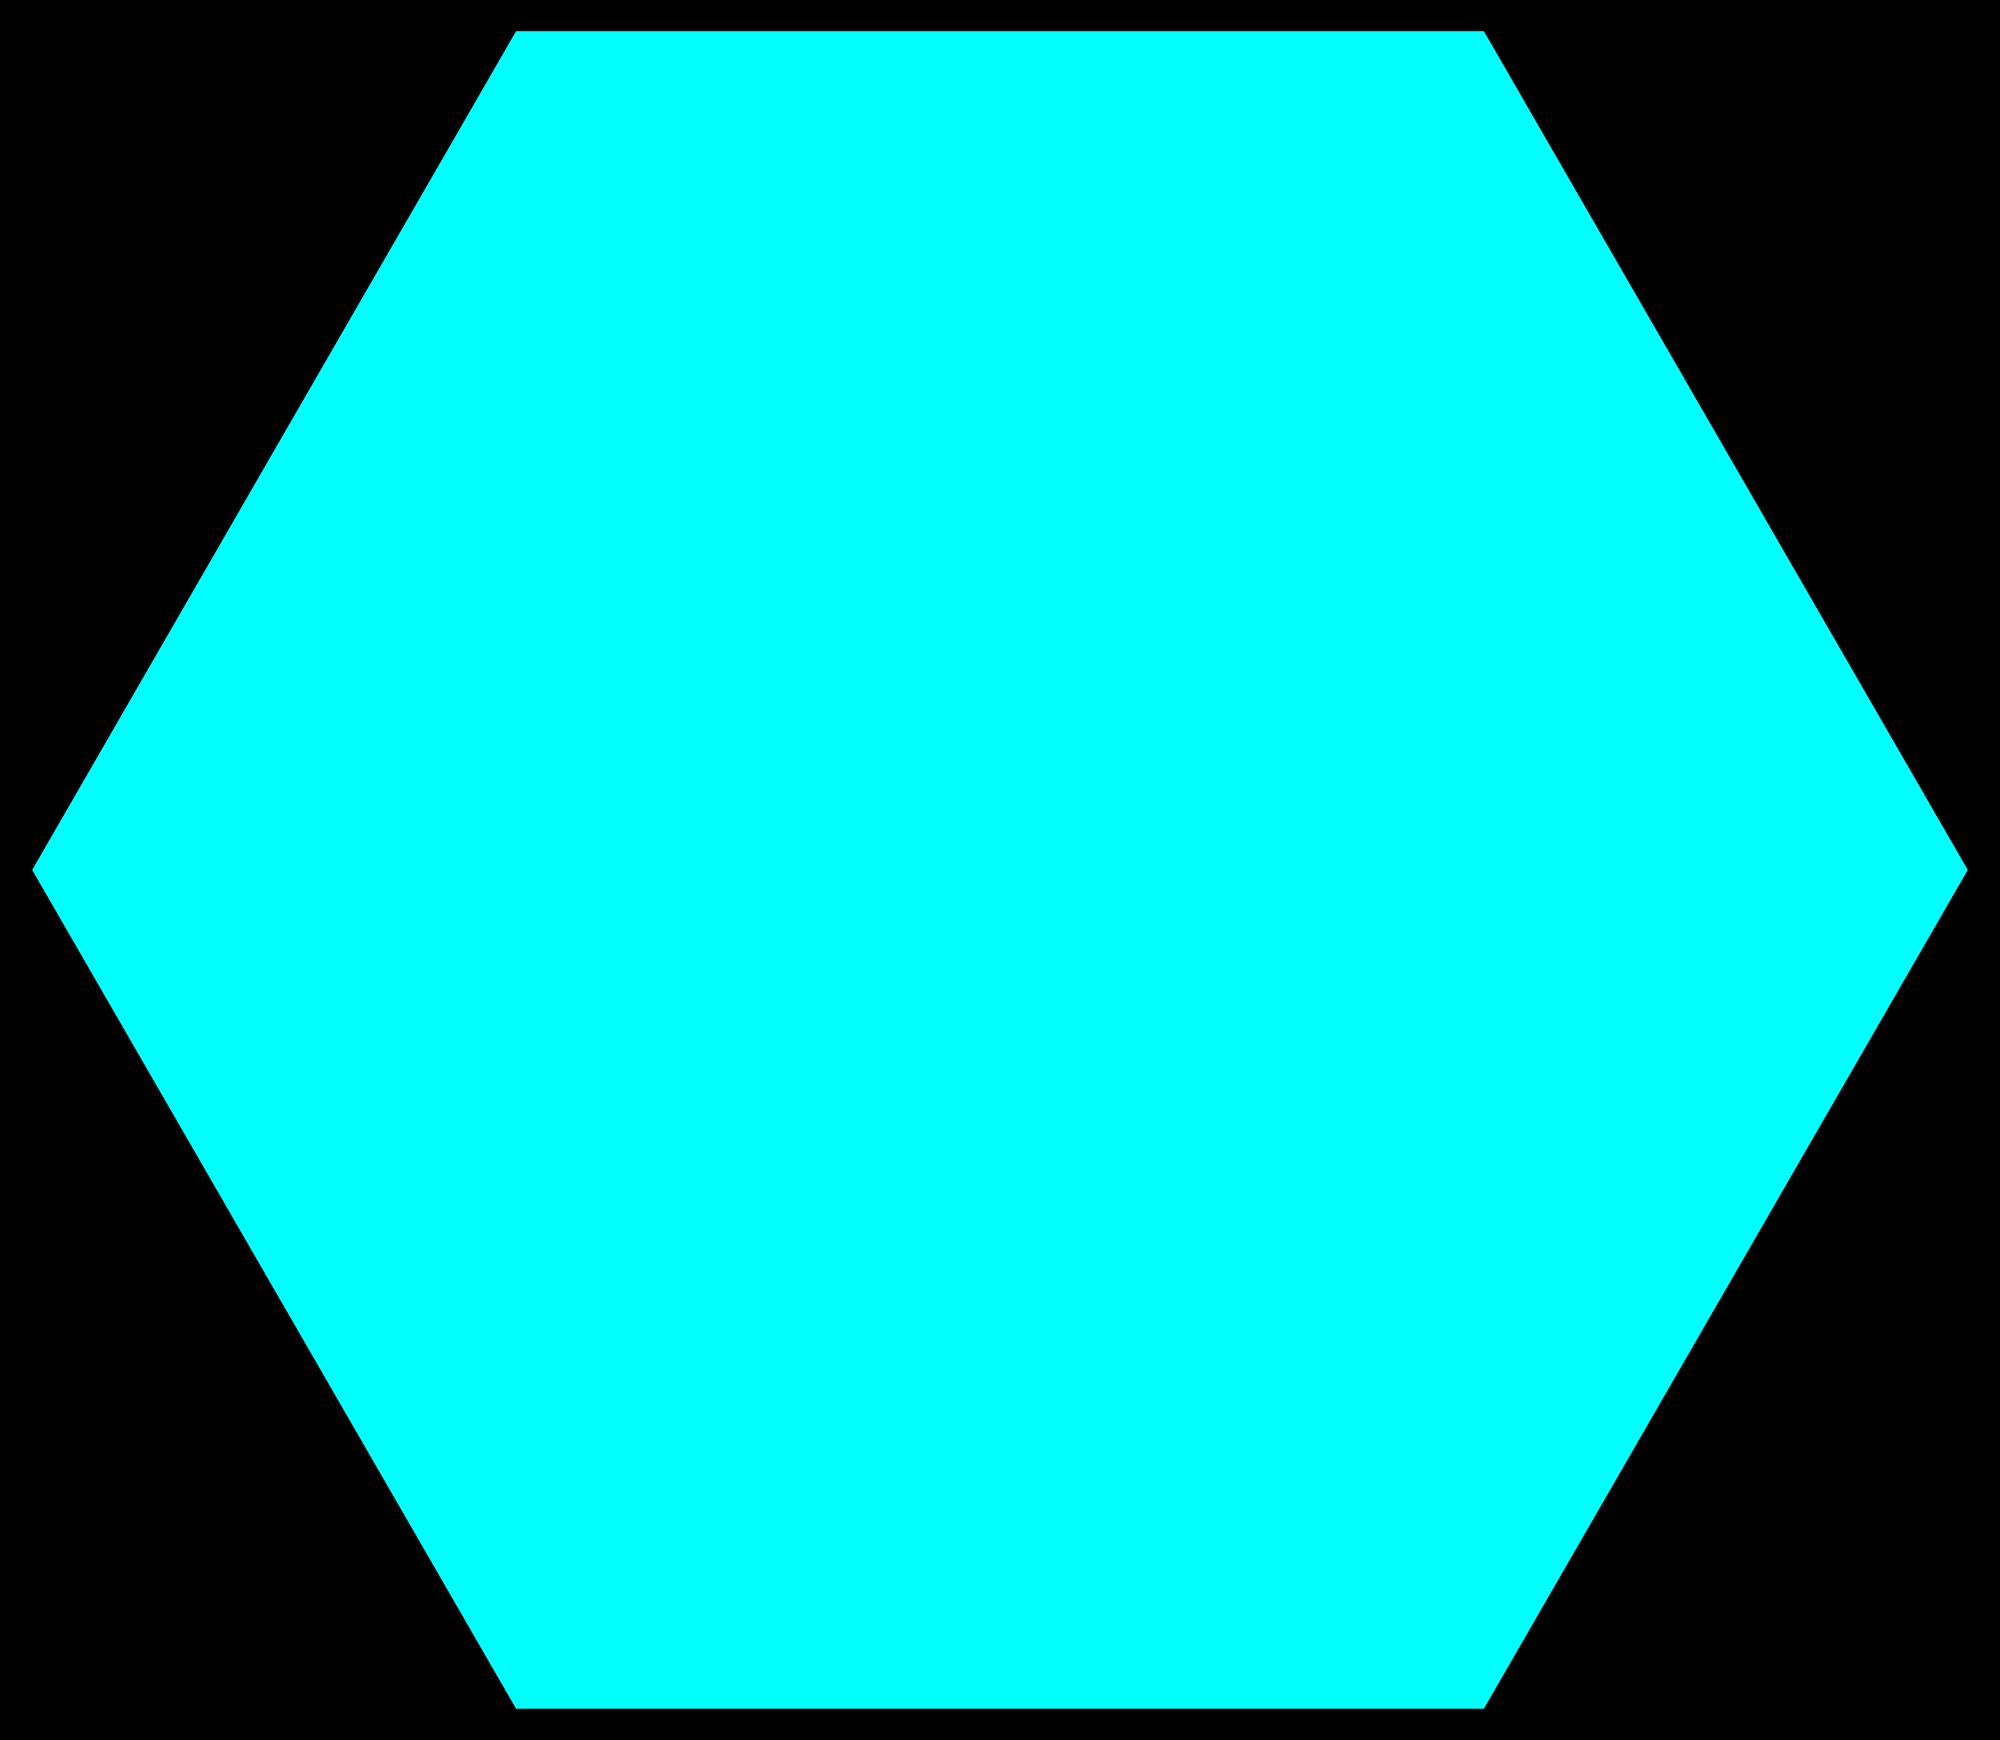 Hexagon svg #15, Download drawings